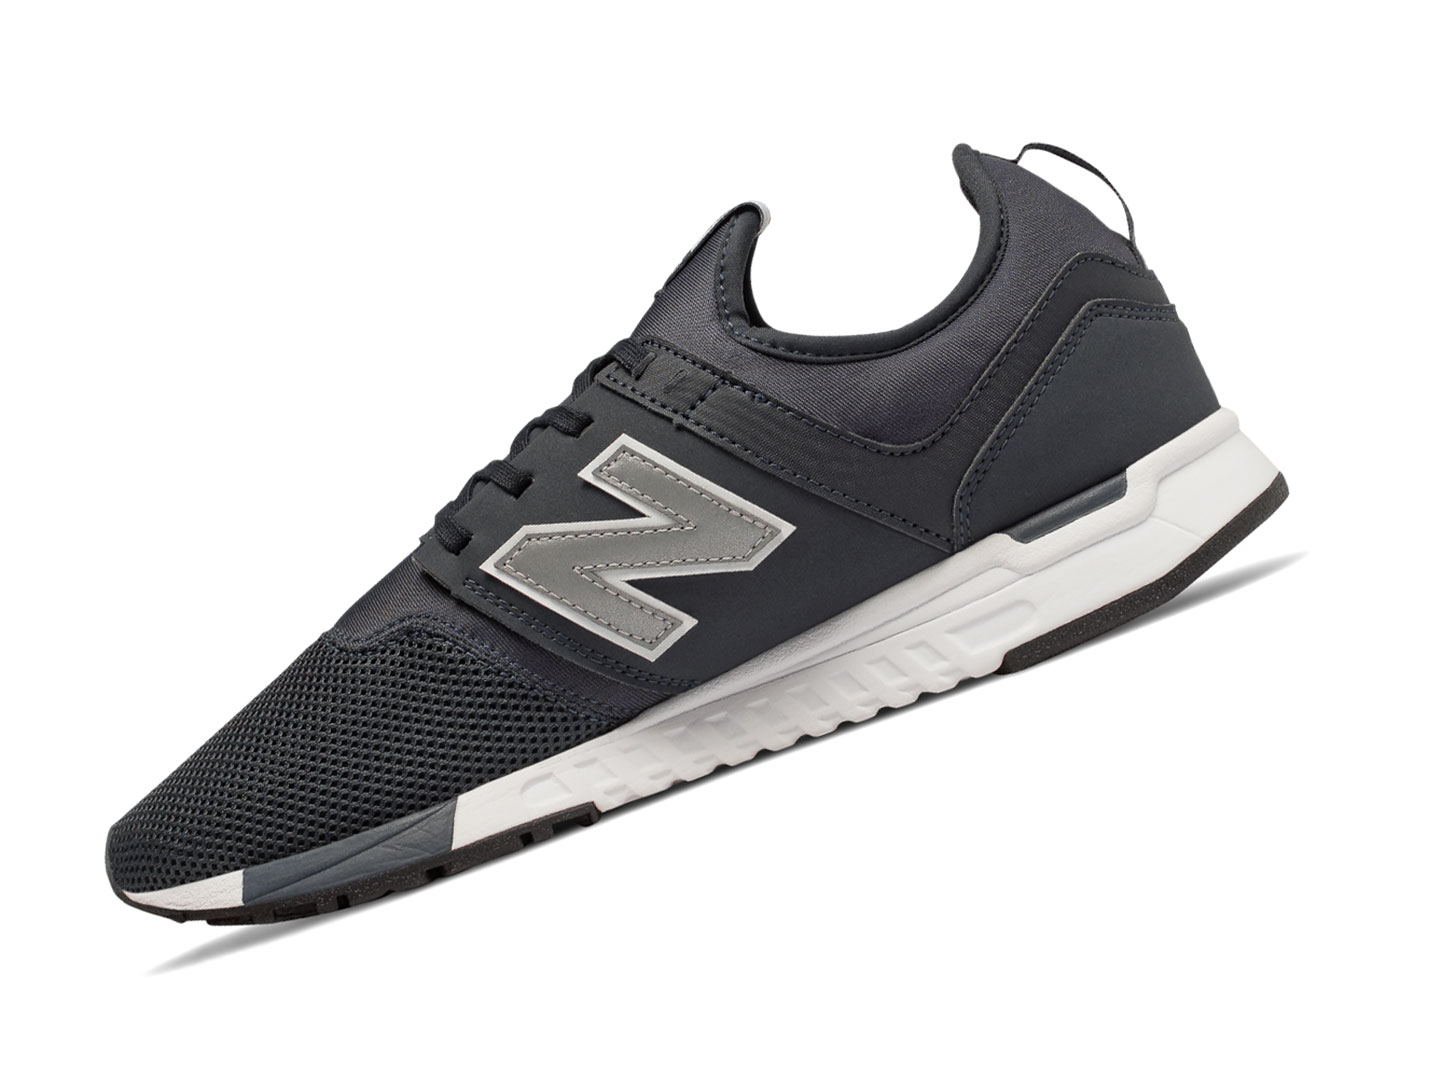 247 New Balance, Marken New Balance